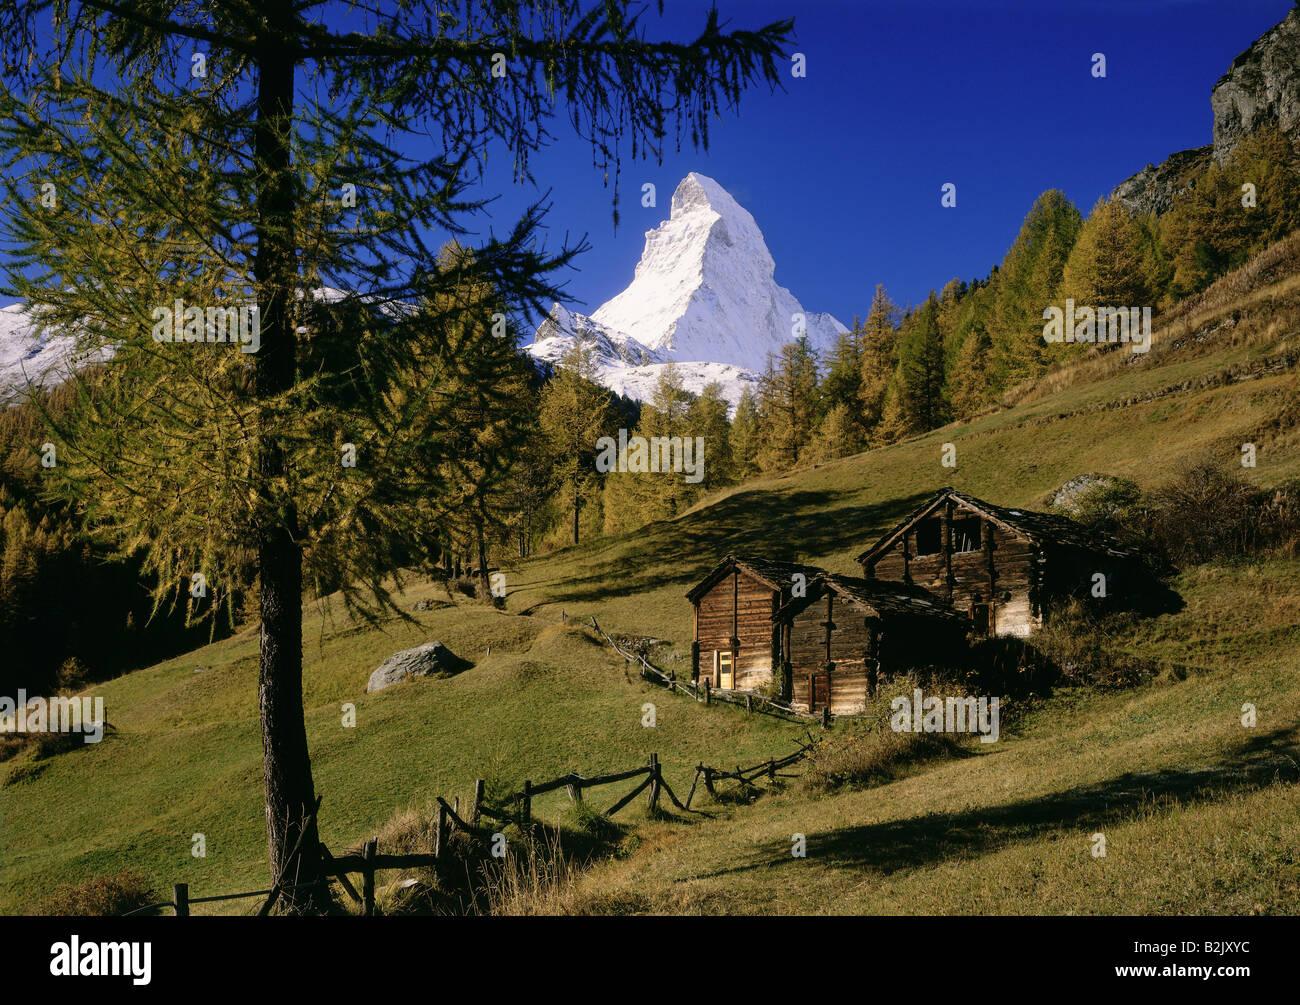 geographie reisen schweiz wallis landschaften matterhorn europa walliser alpen berg. Black Bedroom Furniture Sets. Home Design Ideas